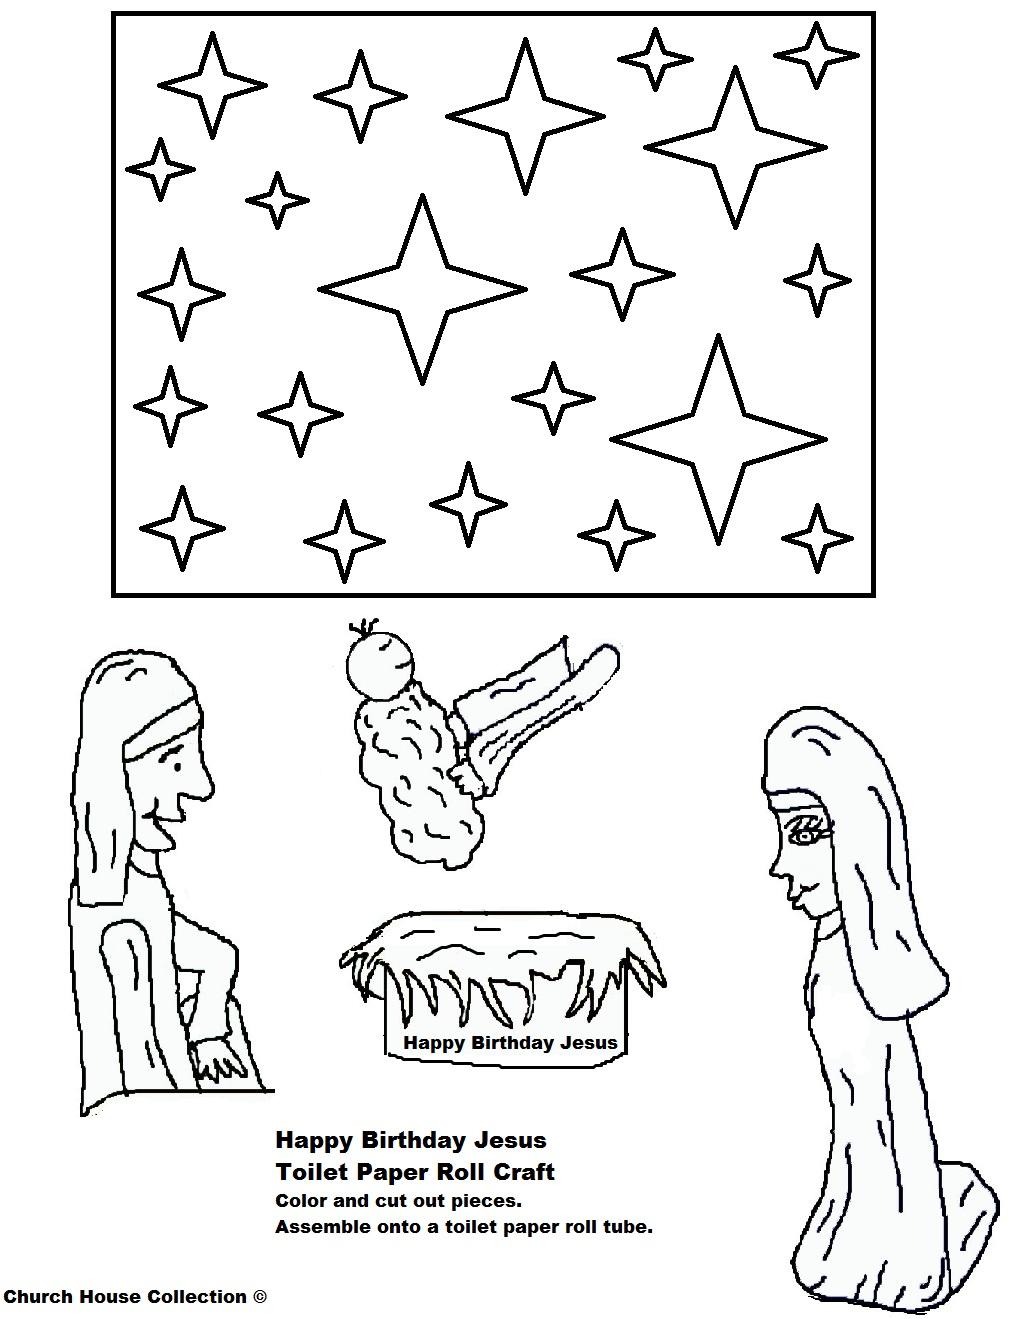 Church House Collection Blog: Happy Birthday Jesus Toilet